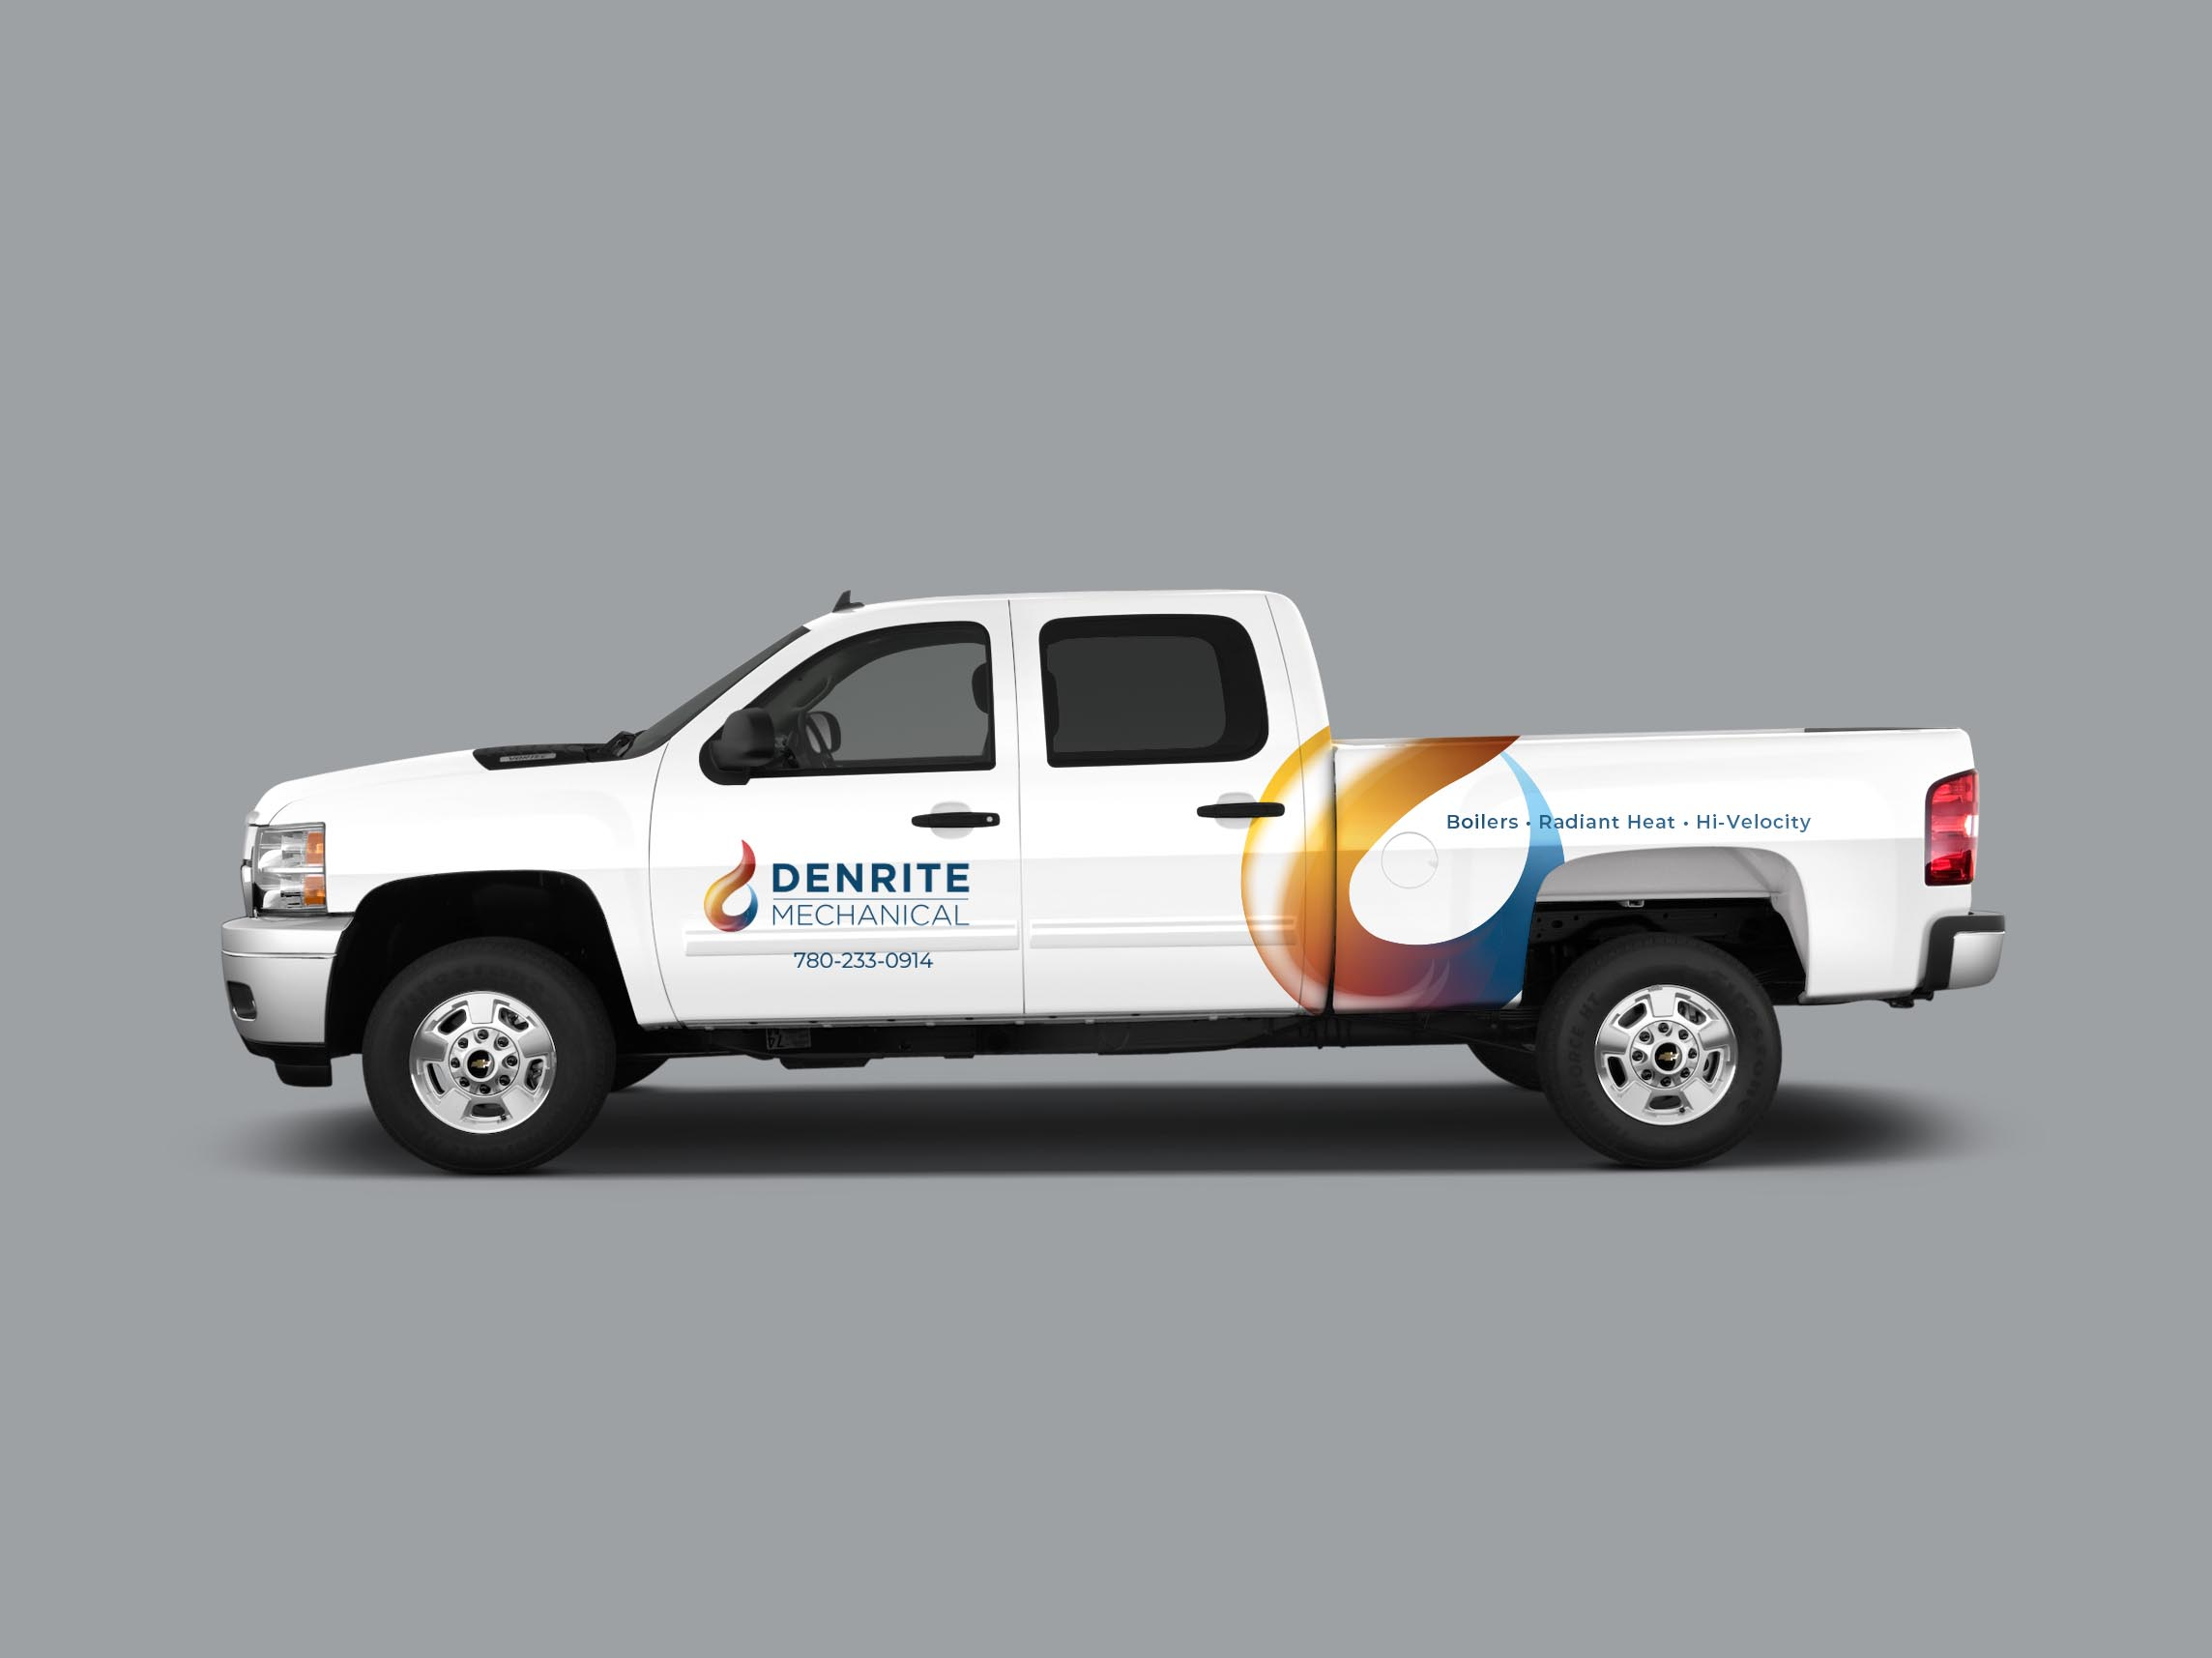 crew truck mockup design